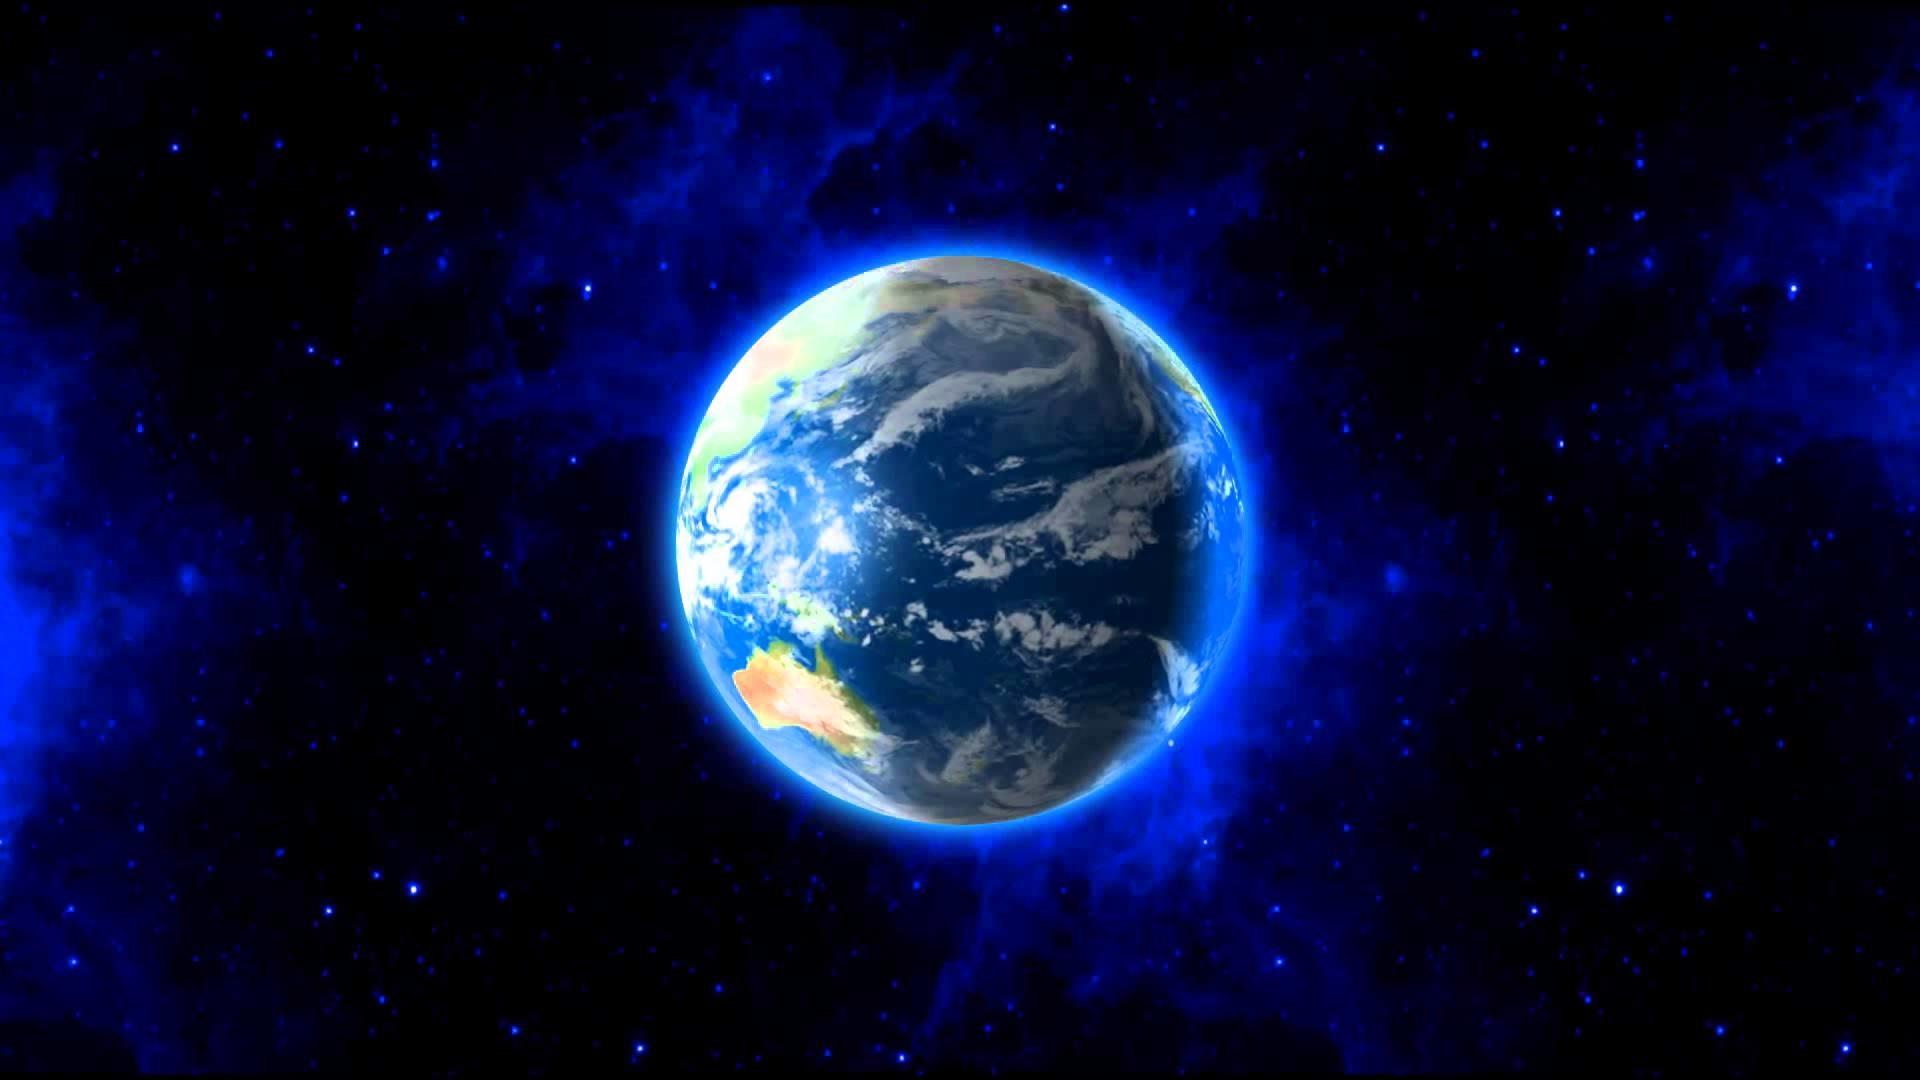 Earth Wallpaper Full Hd: Earth Wallpaper HD 1080p (78+ Images